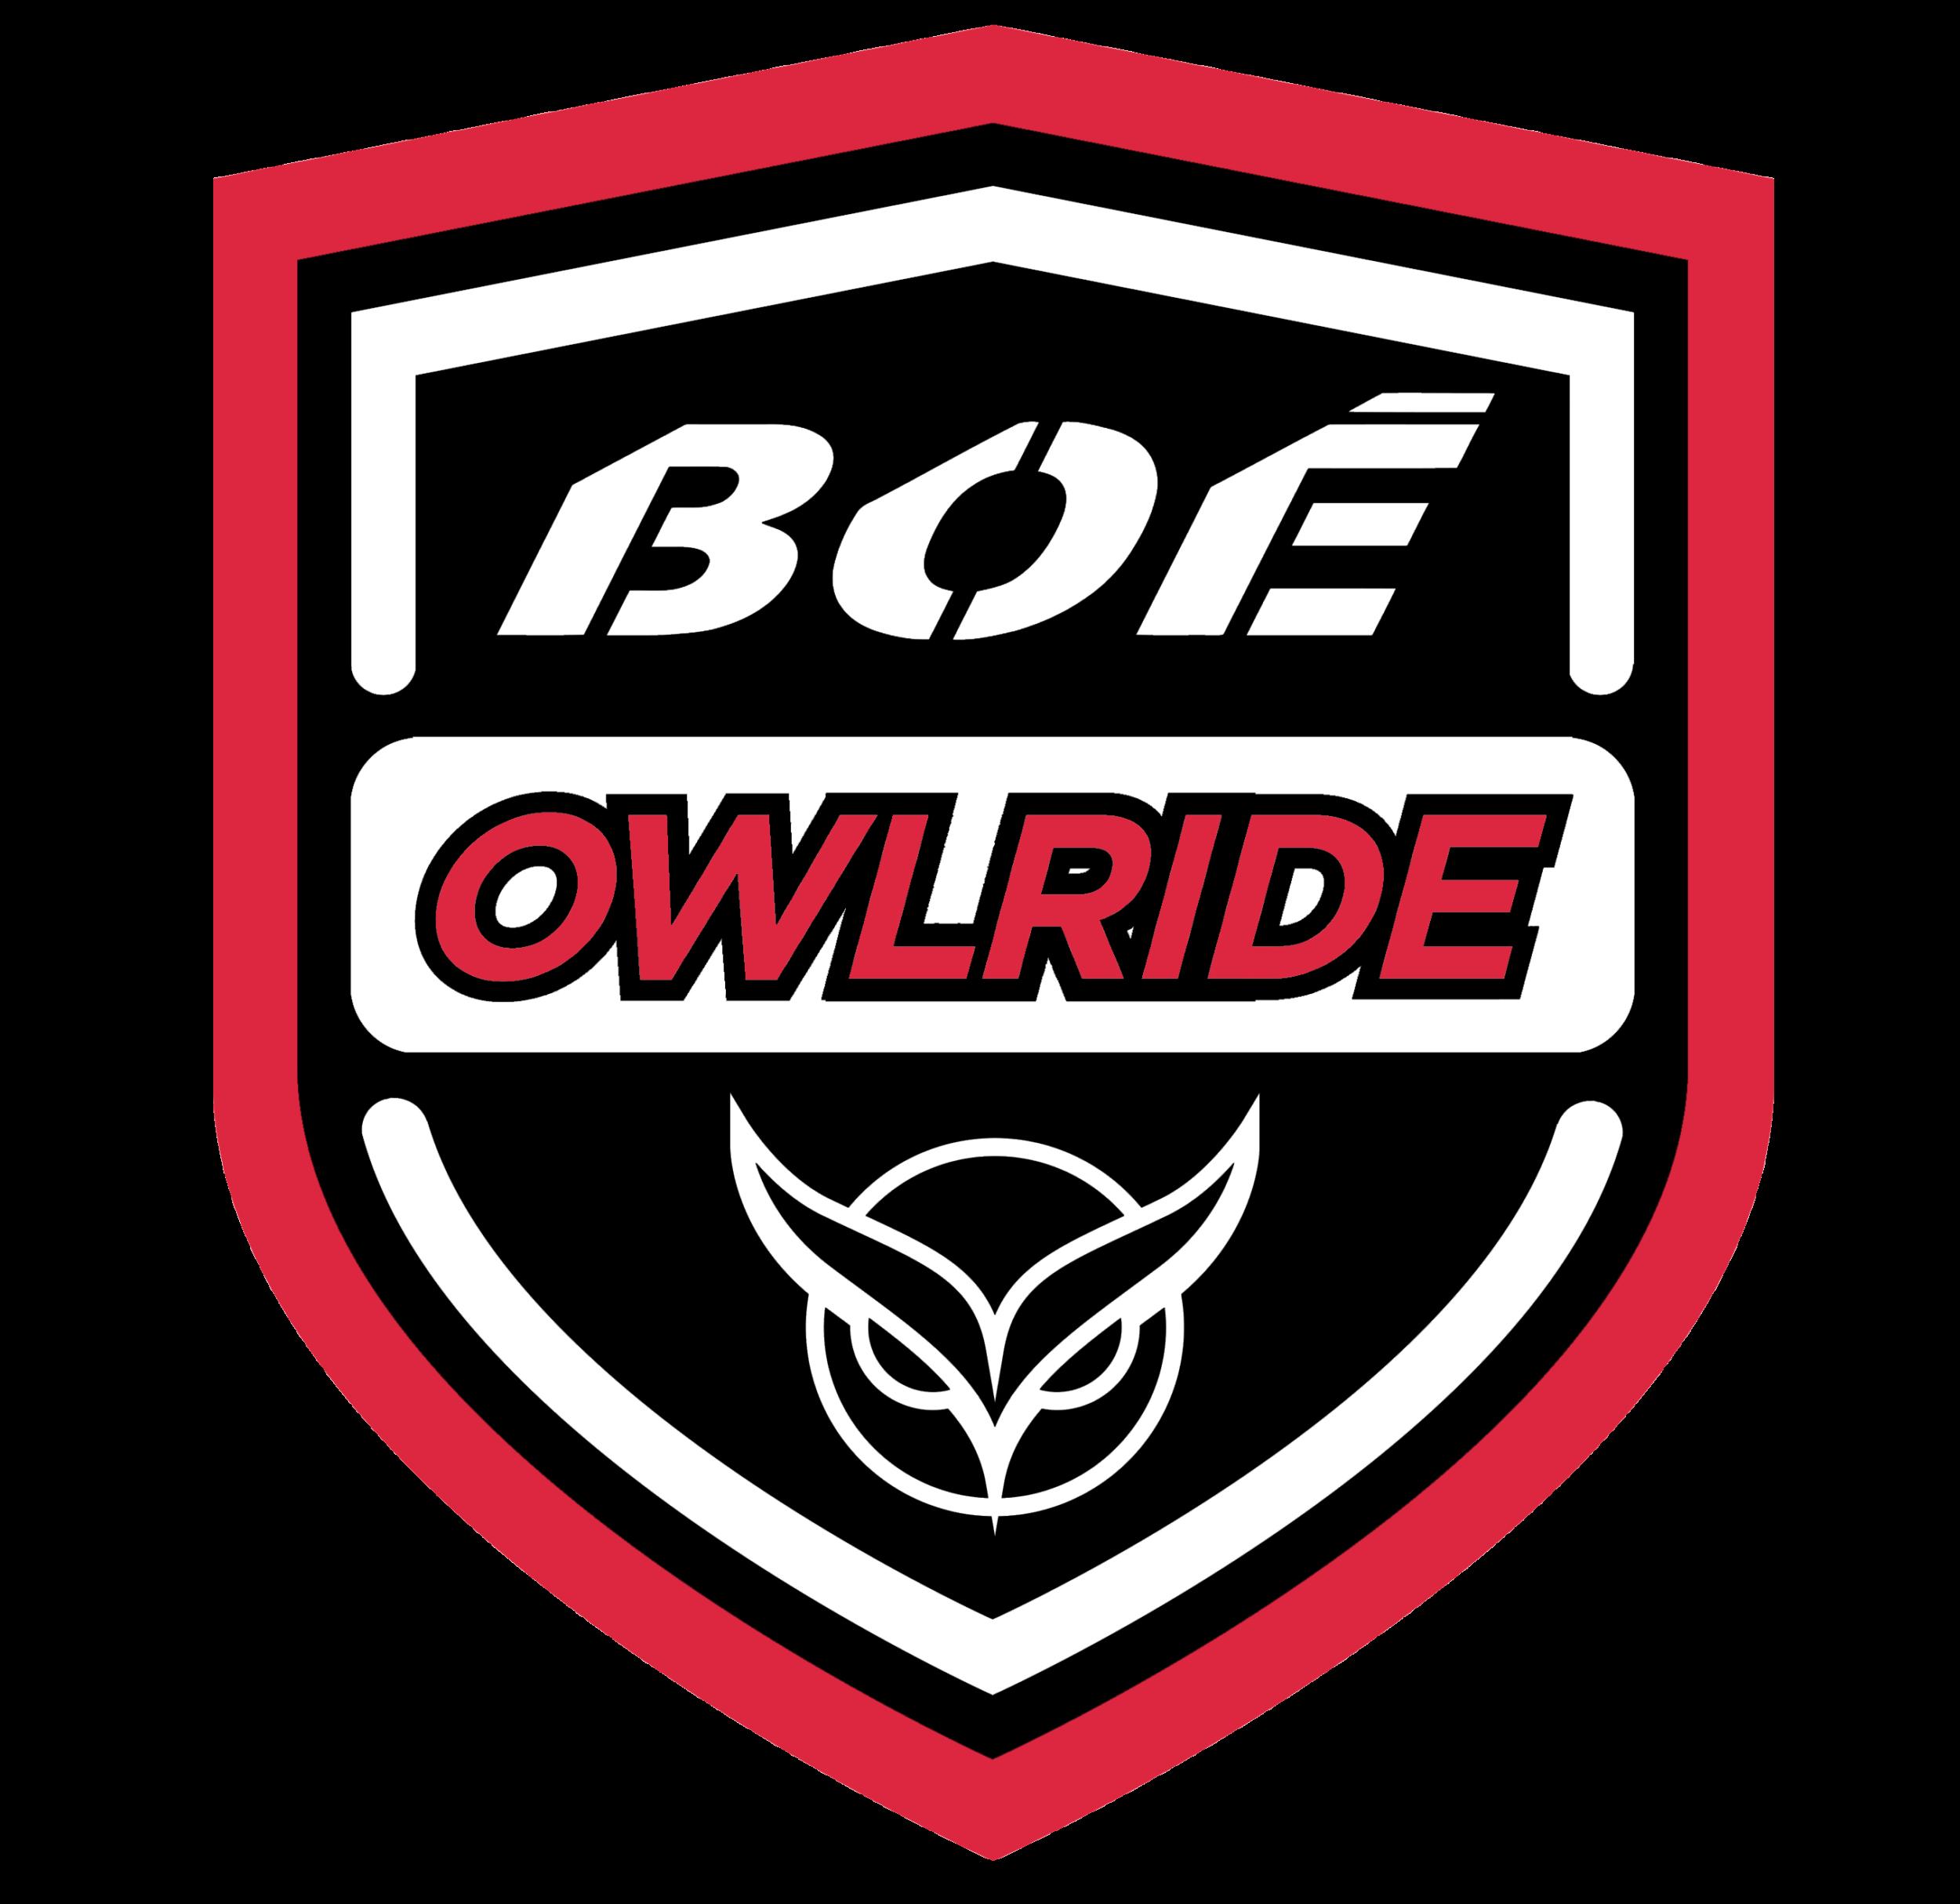 BOE OWLRIDE